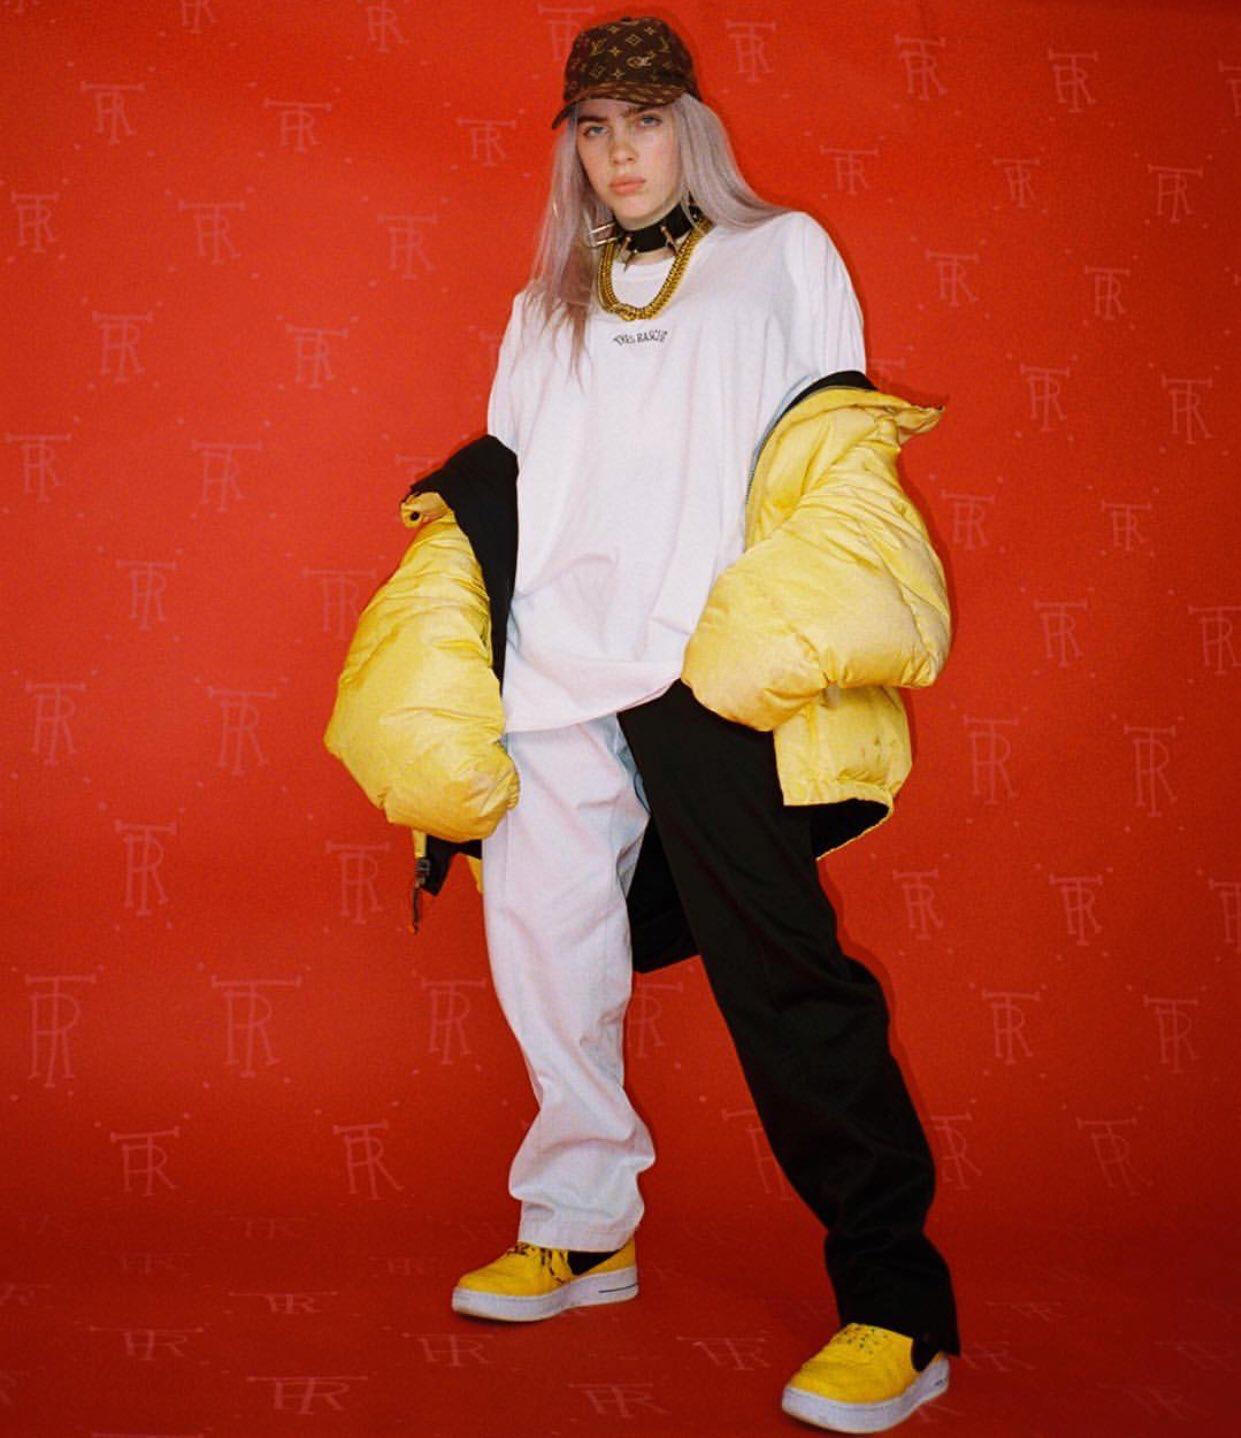 Omg Lmfaooooo Yall Really Snapping Billie Oversized White T